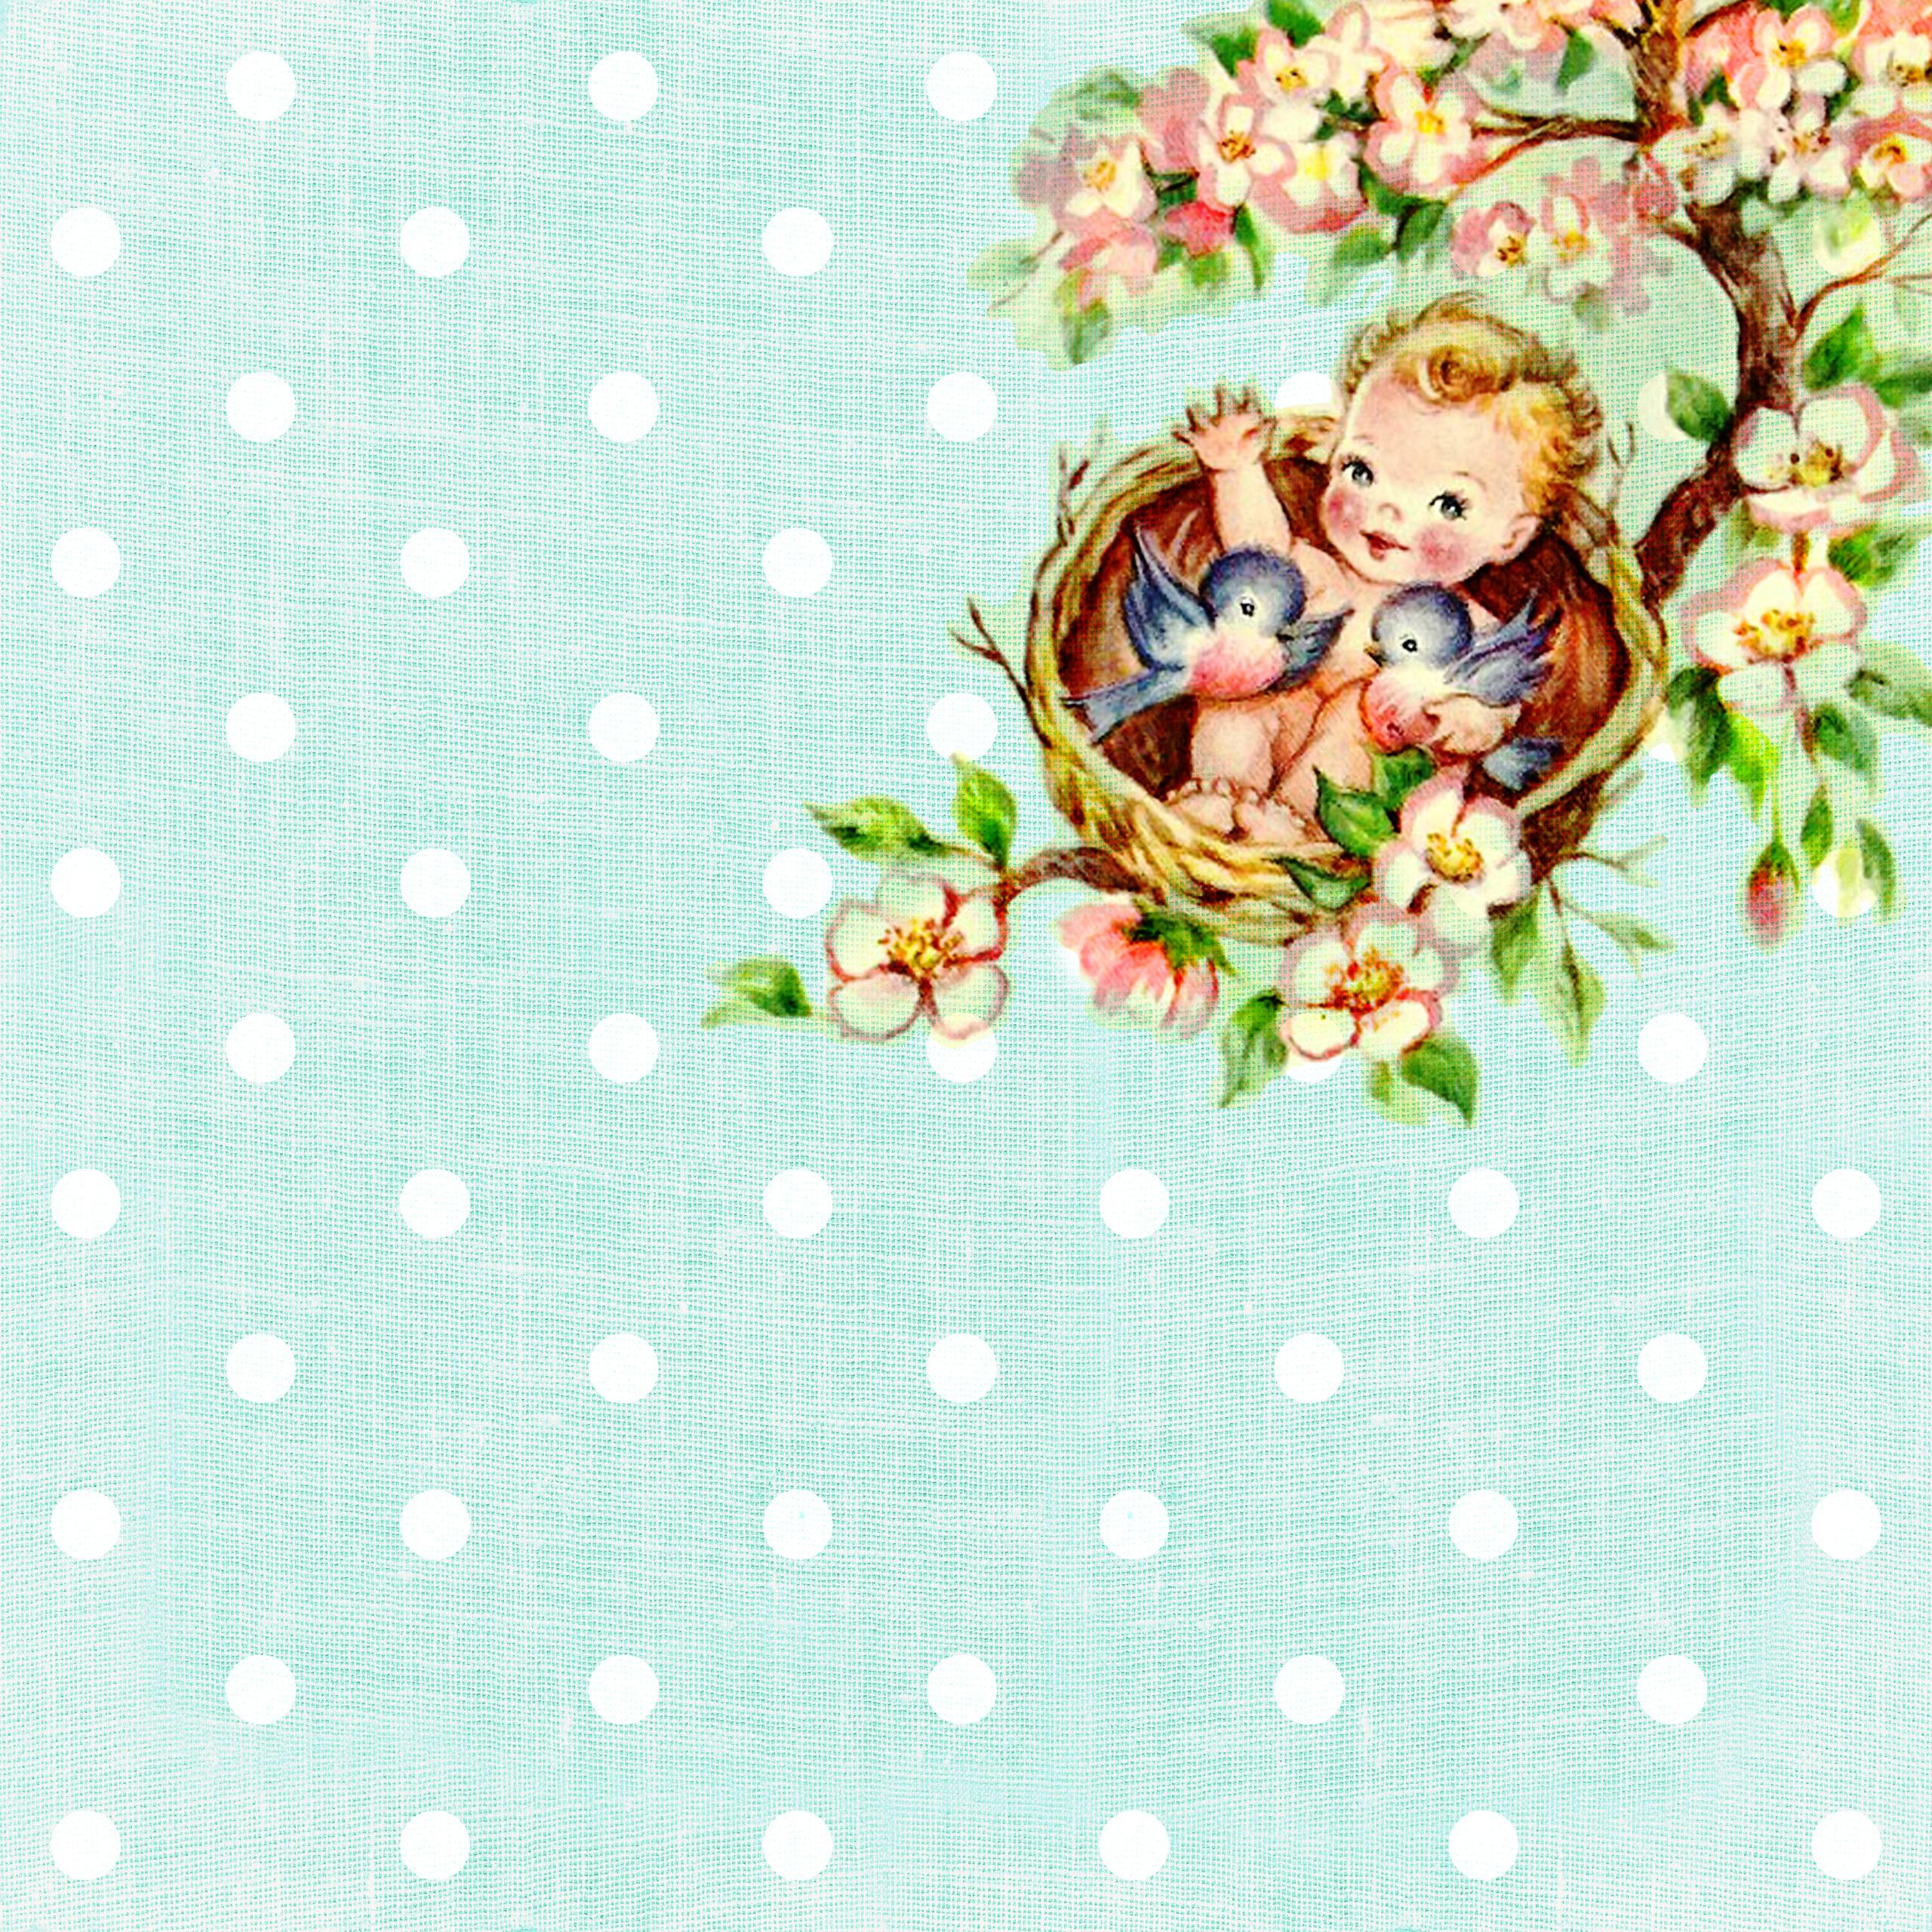 Free Digital Scrapbooking Paper Vintage Baby On The Tree Top Part 3